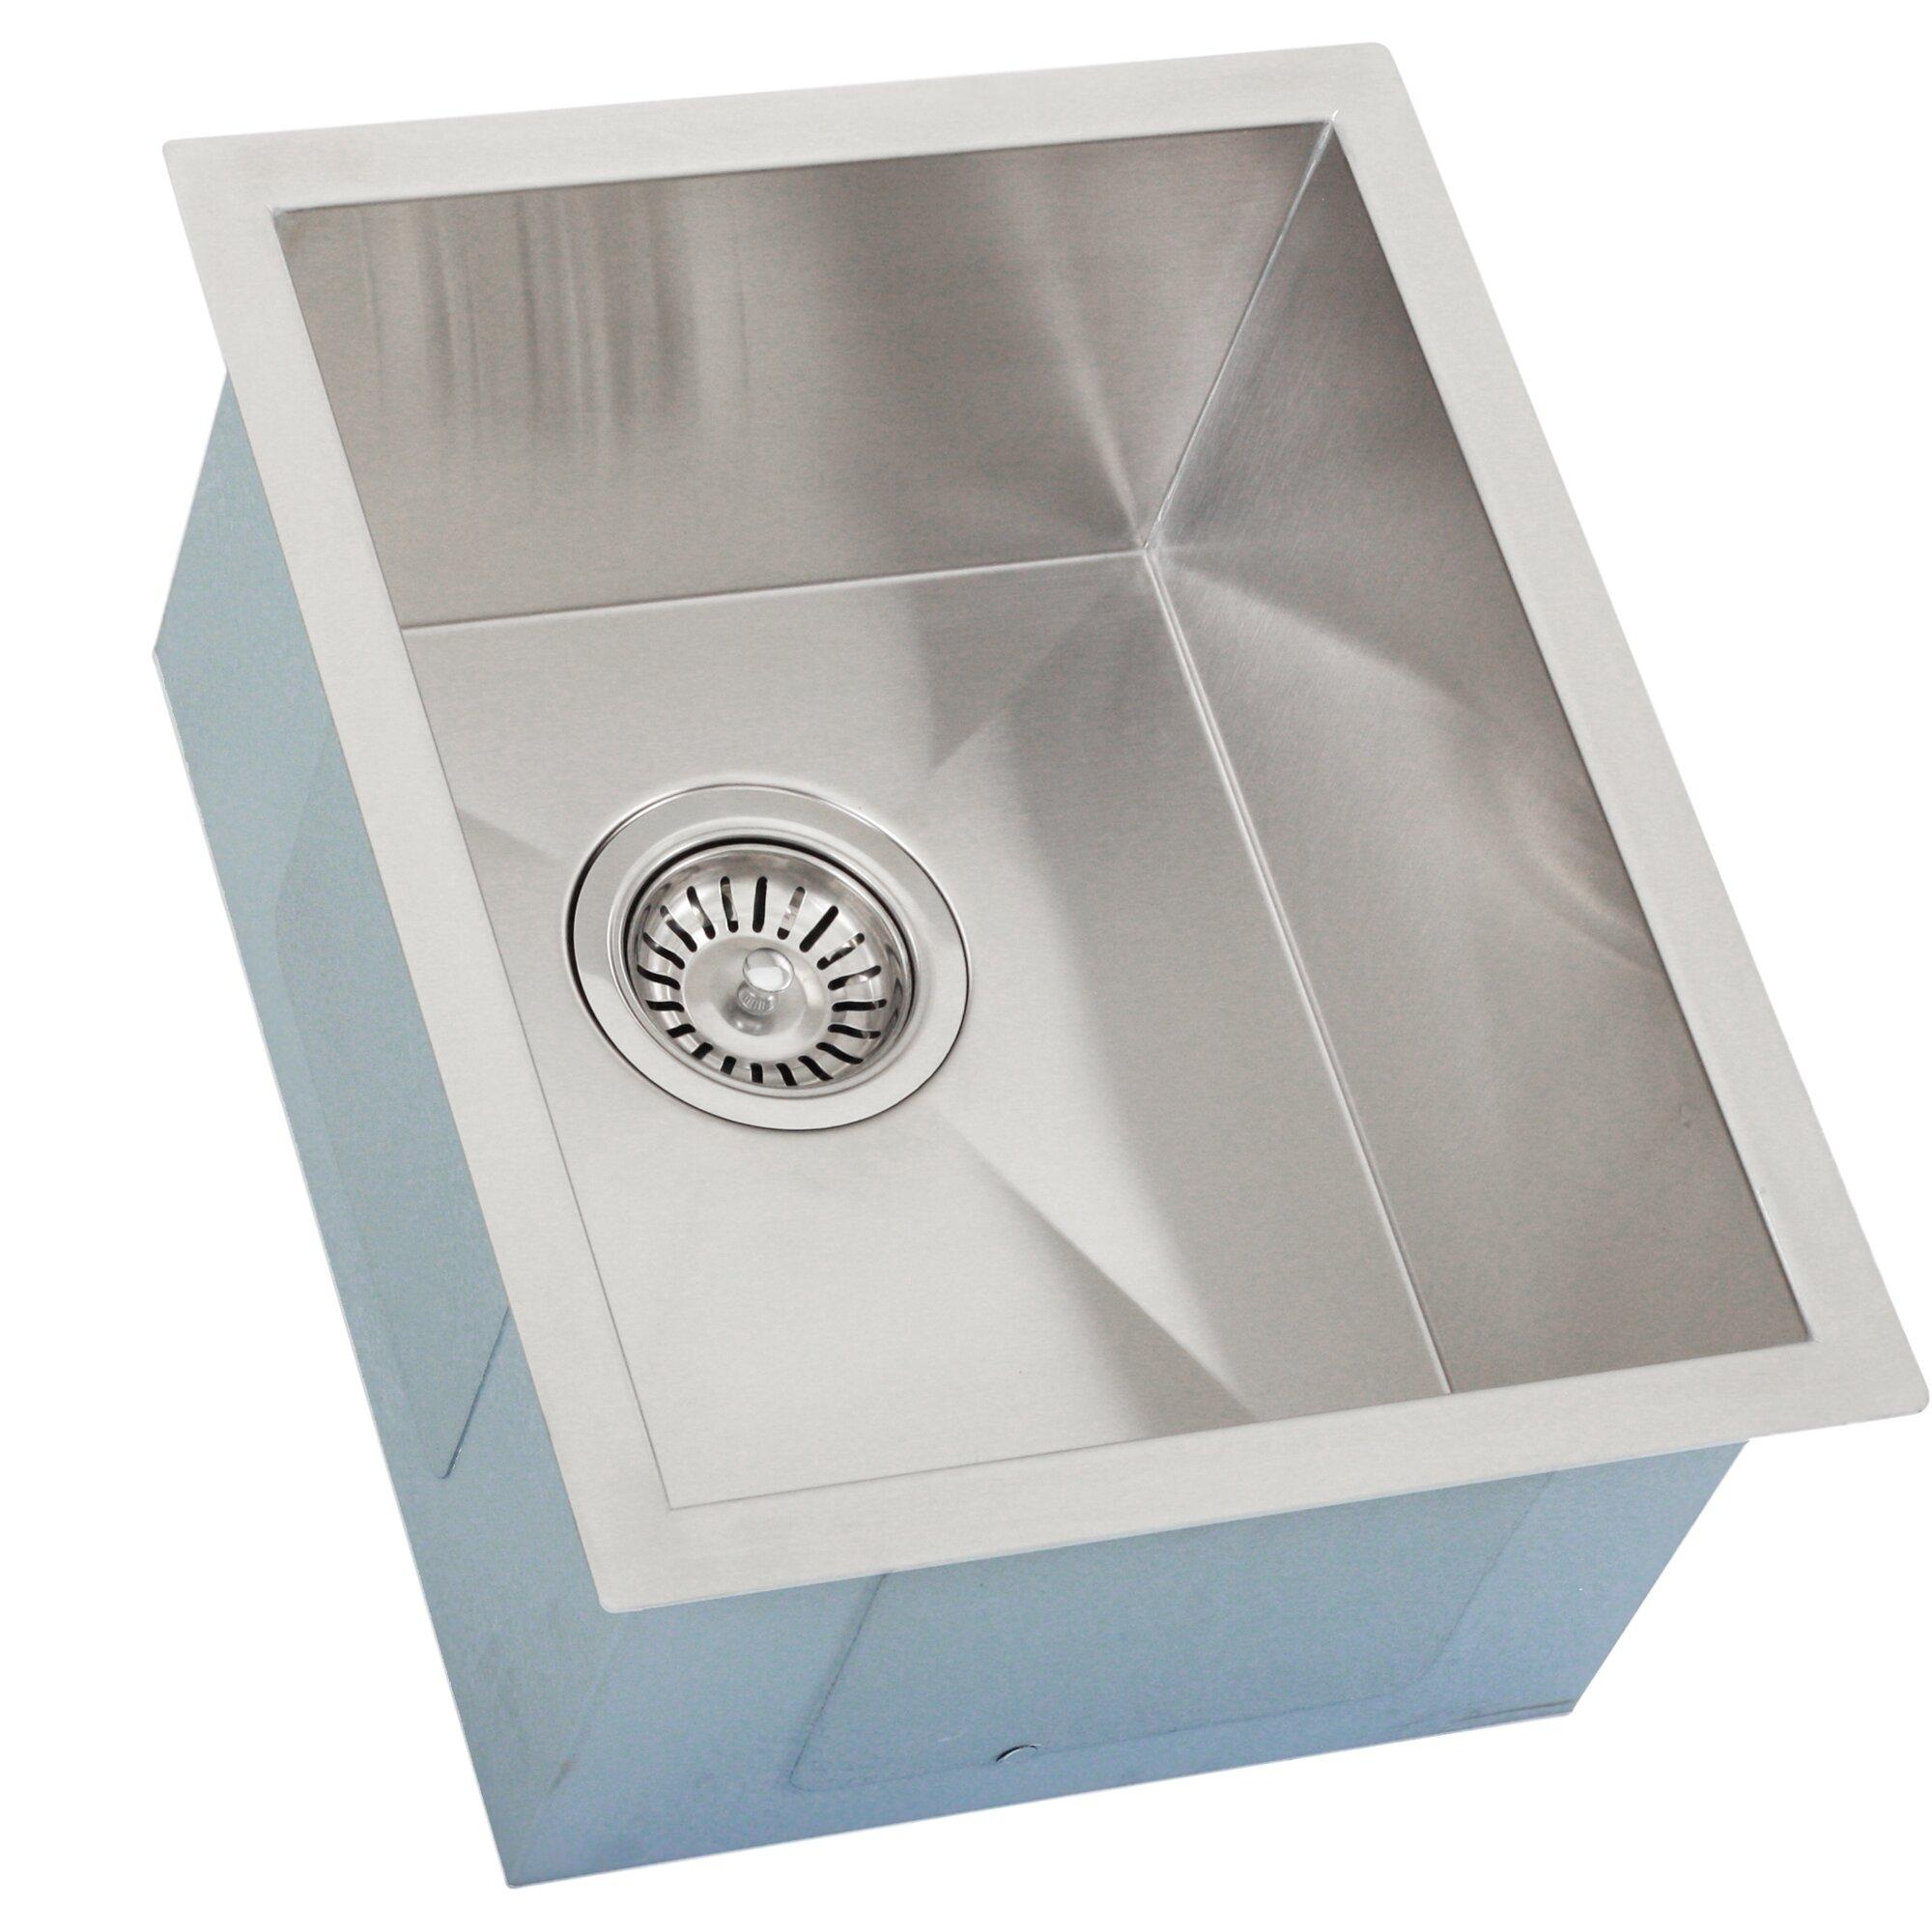 Ticor Sinks : Remodel Sinks Kitchen Sinks Ticor Sinks Part #: S3620BG-DEL SKU ...